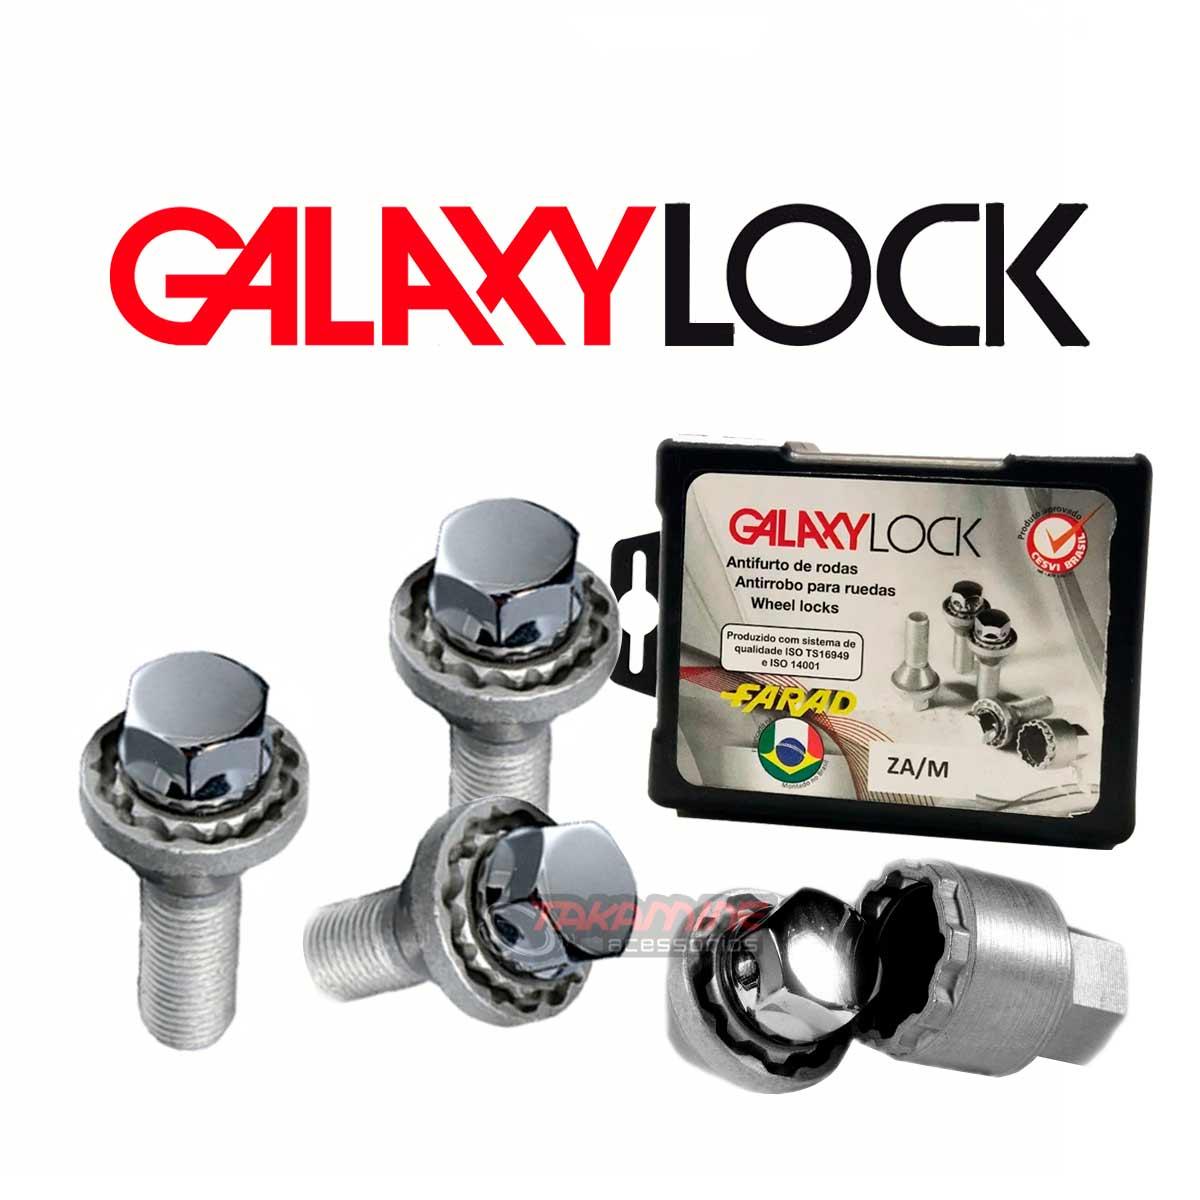 Parafuso antifurto para rodas Galaxy Lock Gol 1980 até 2020 (roda de liga) L2/M